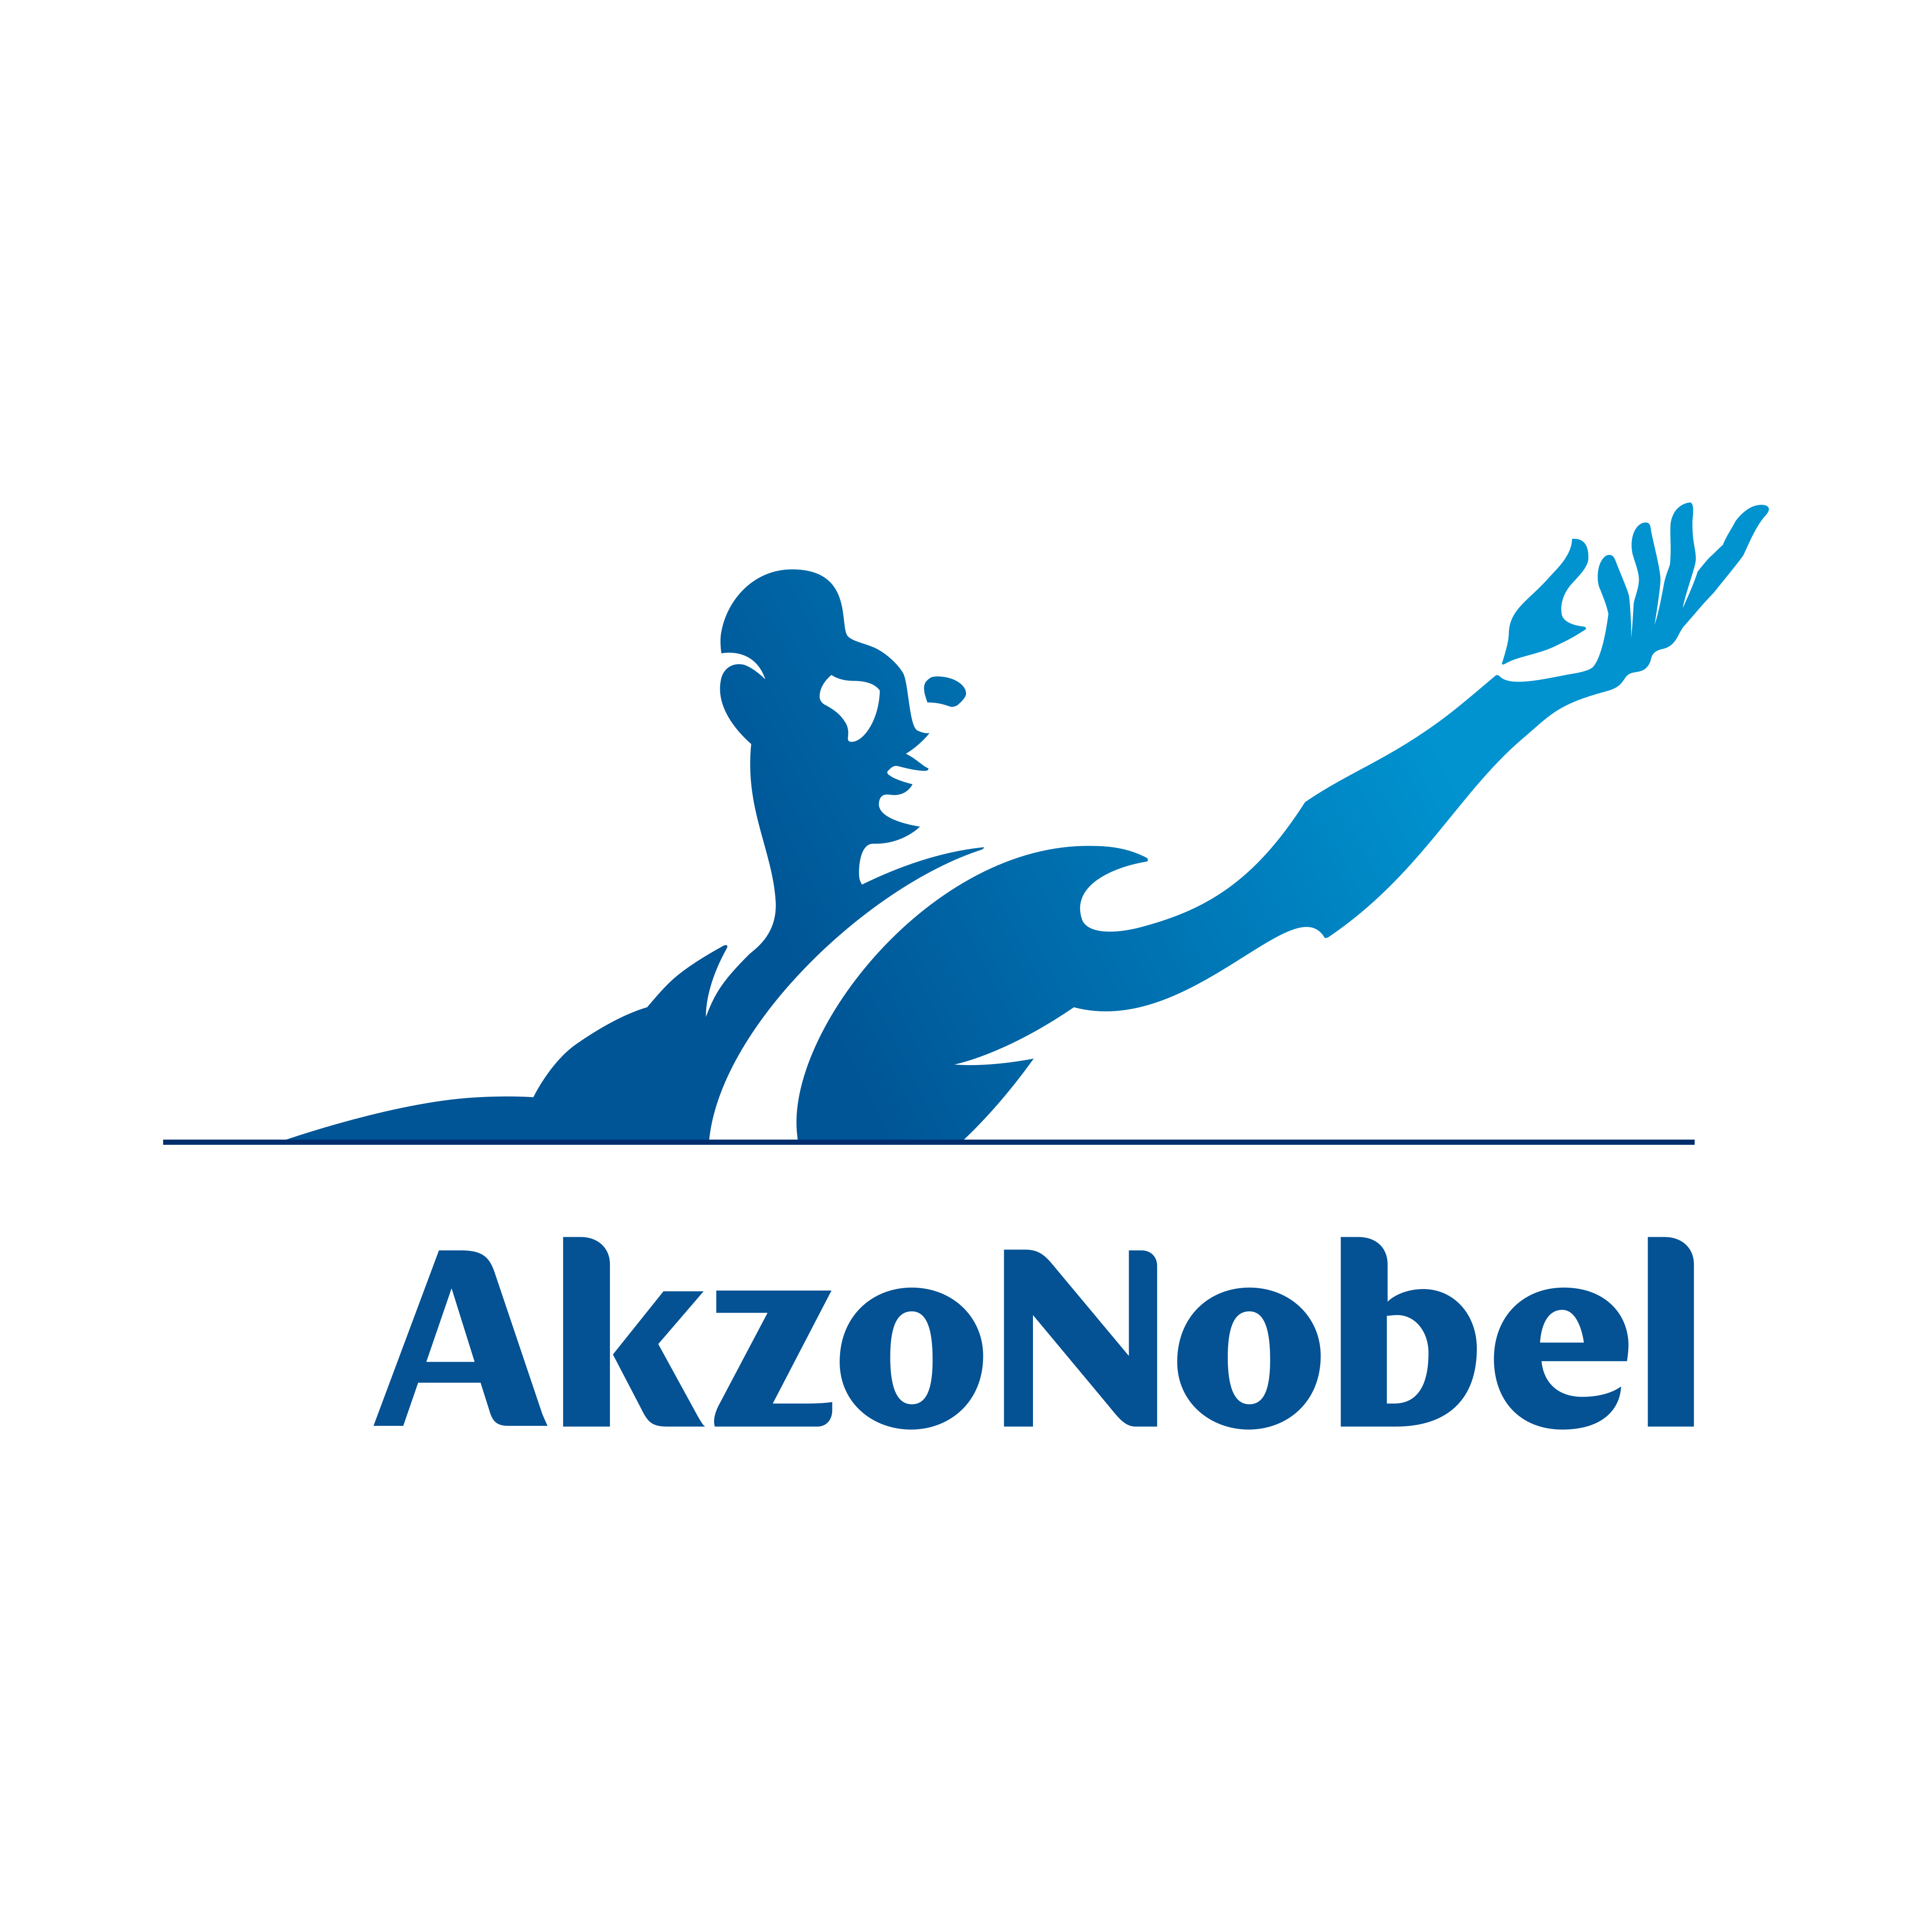 akzo nobel logo 0 - AkzoNobel Logo